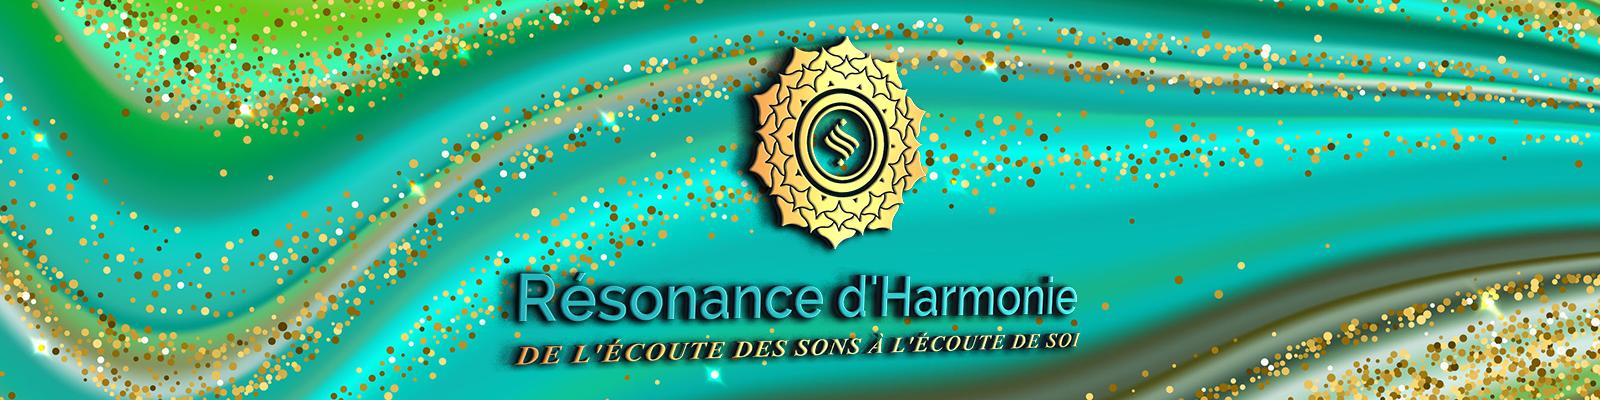 Résonance d'Harmonie